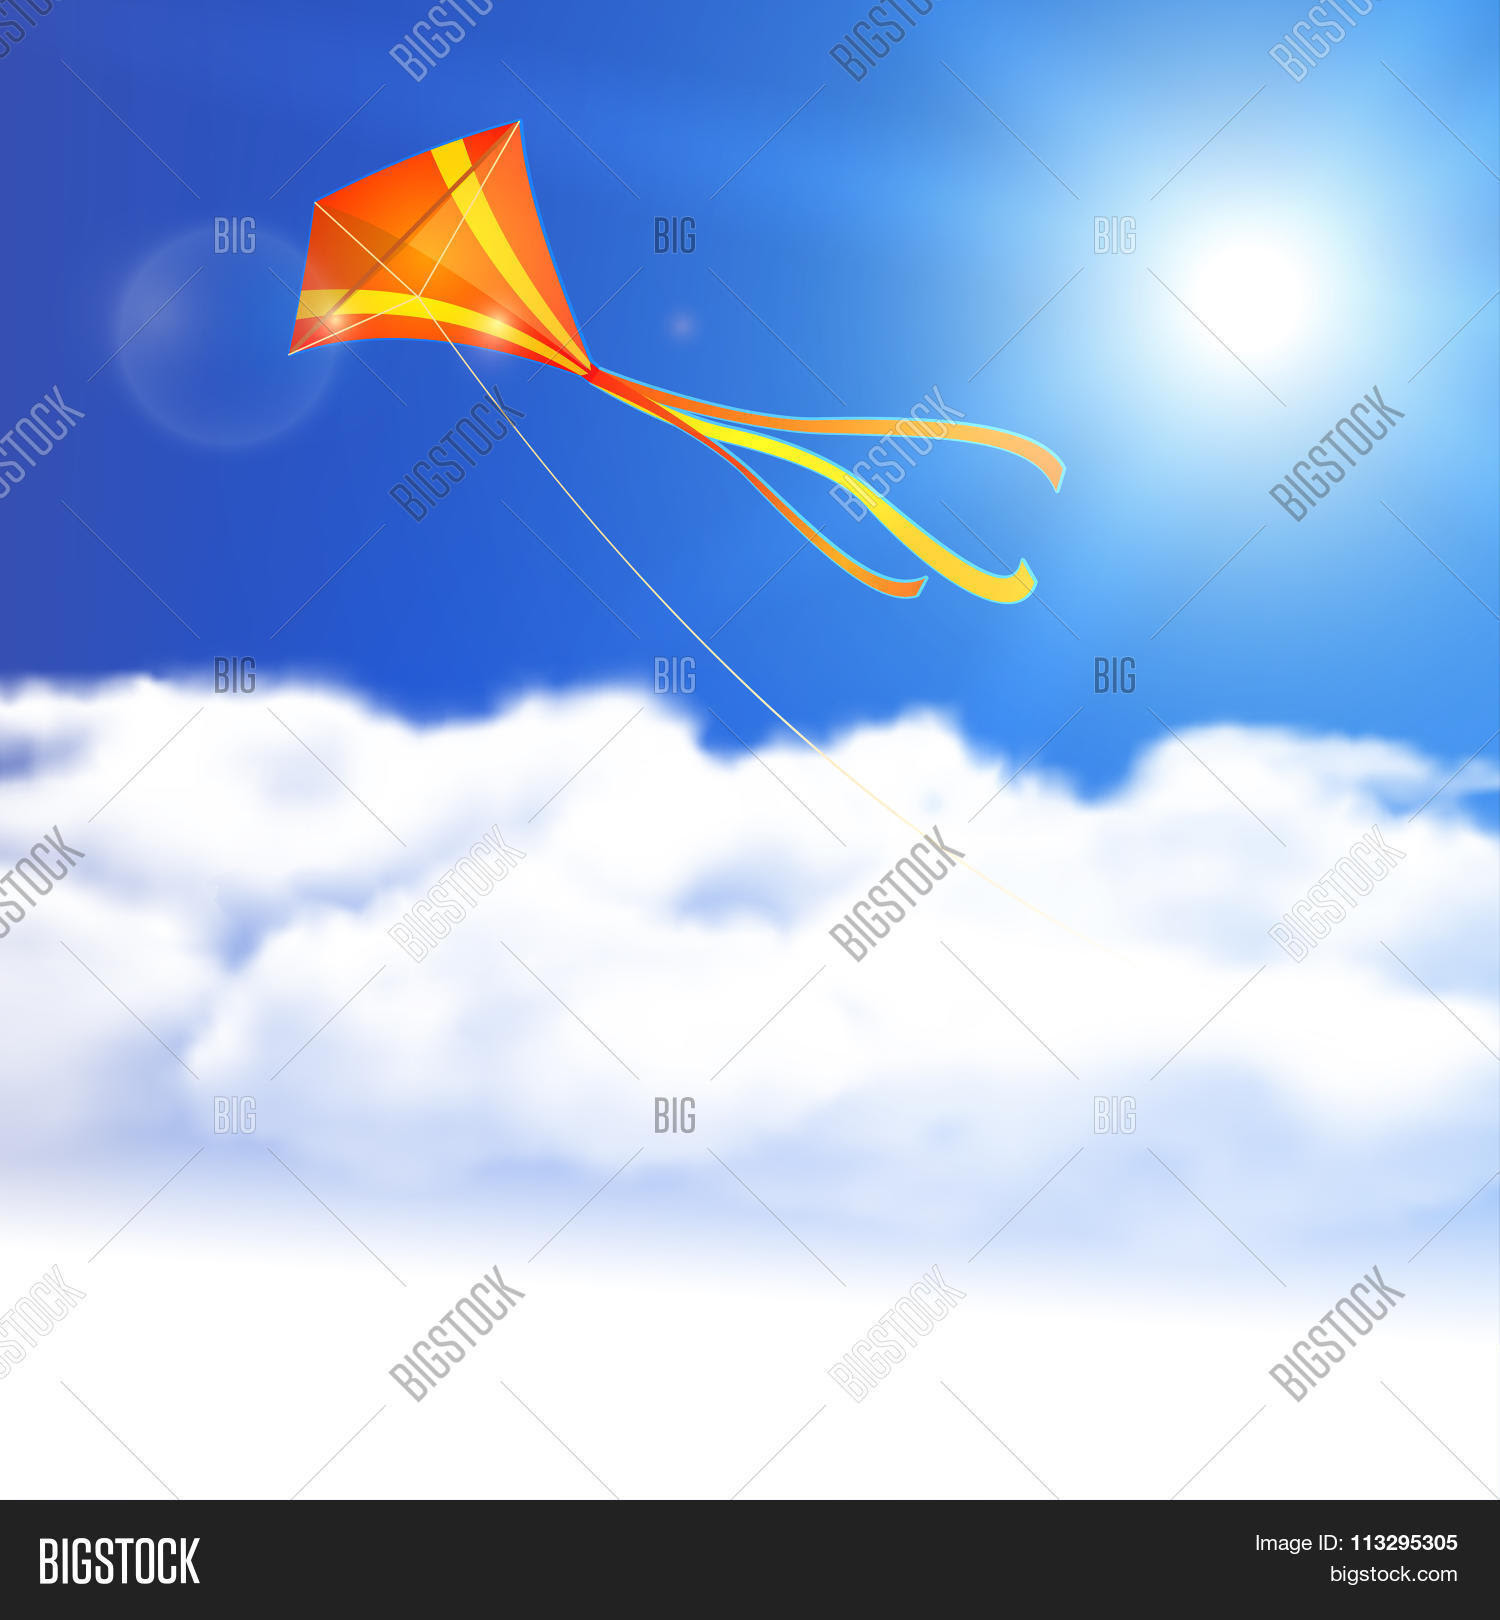 Kite In The Sky. Vector Illustration, Eps10, Editable. Stock ...